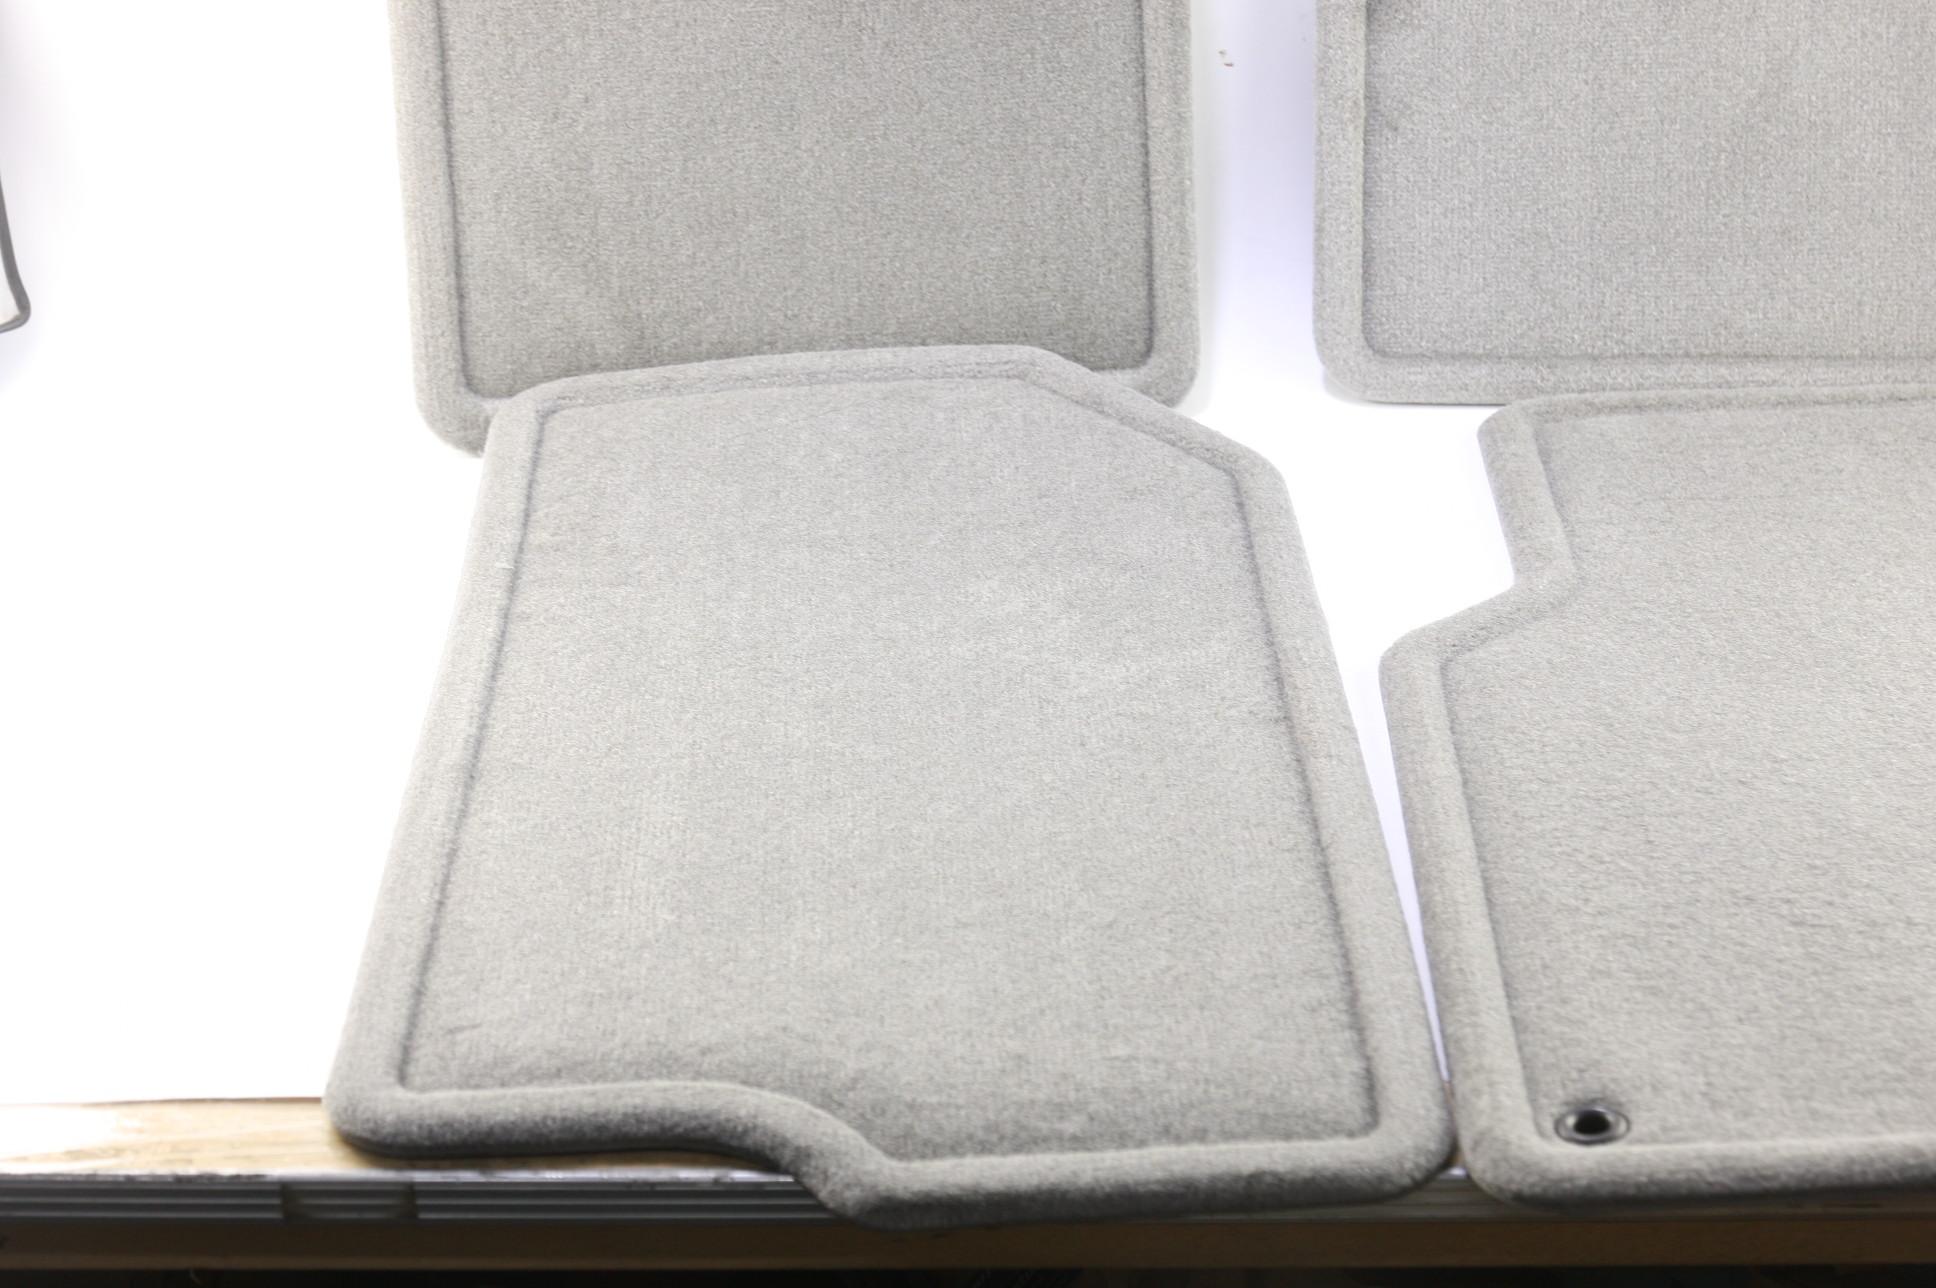 New GM OEM 15290071 05-09 Equinox Front and Rear Custom Carpet Floor Mats Gray - image 7